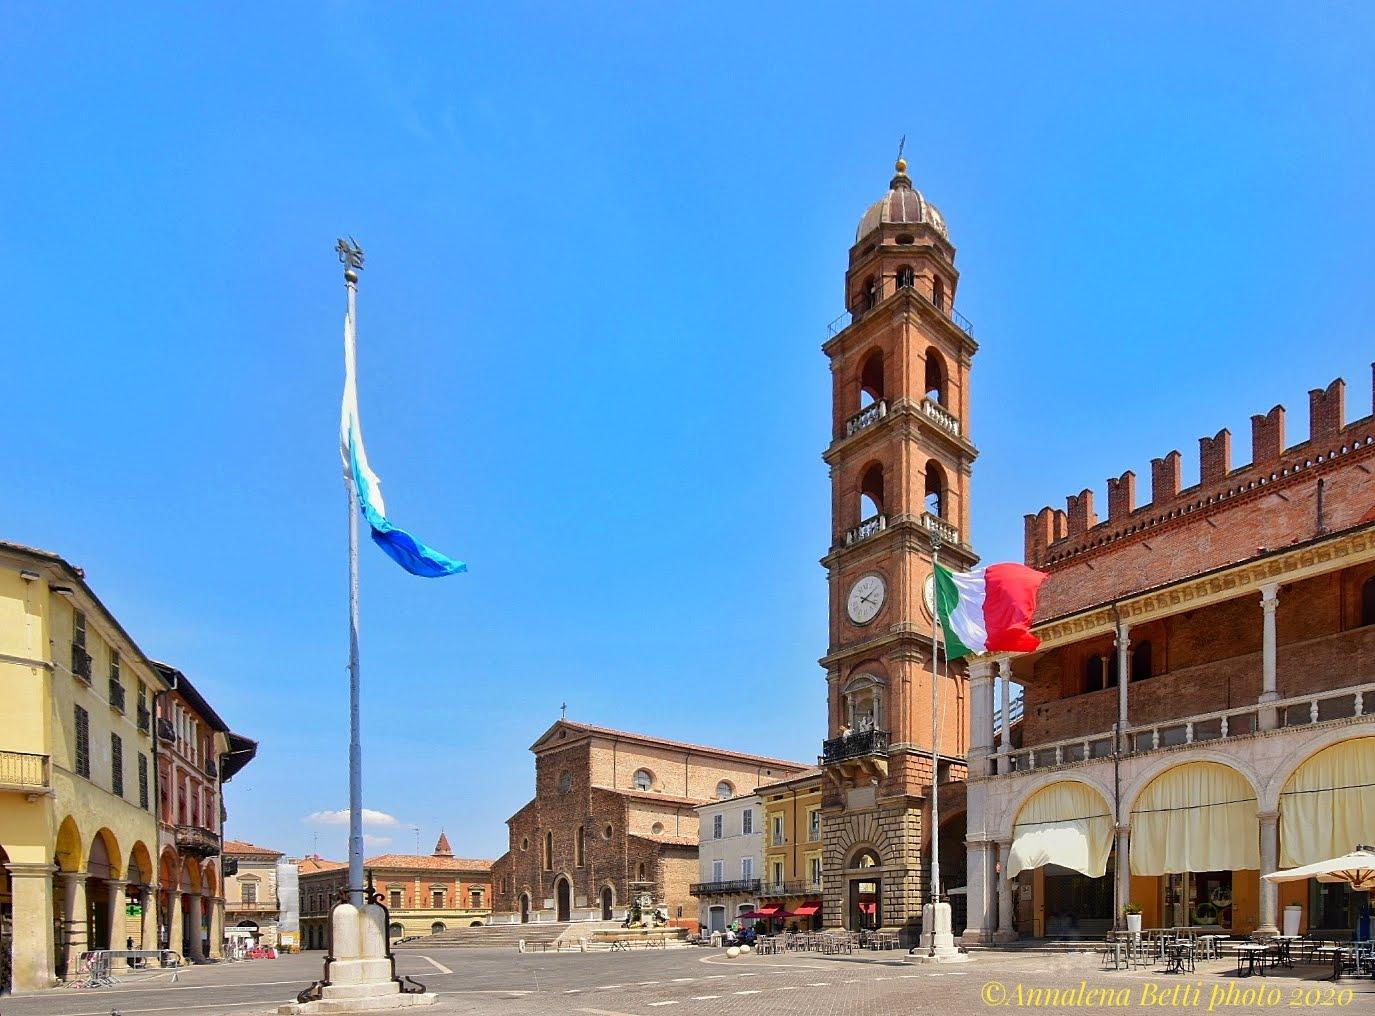 People's Square Faenza ...